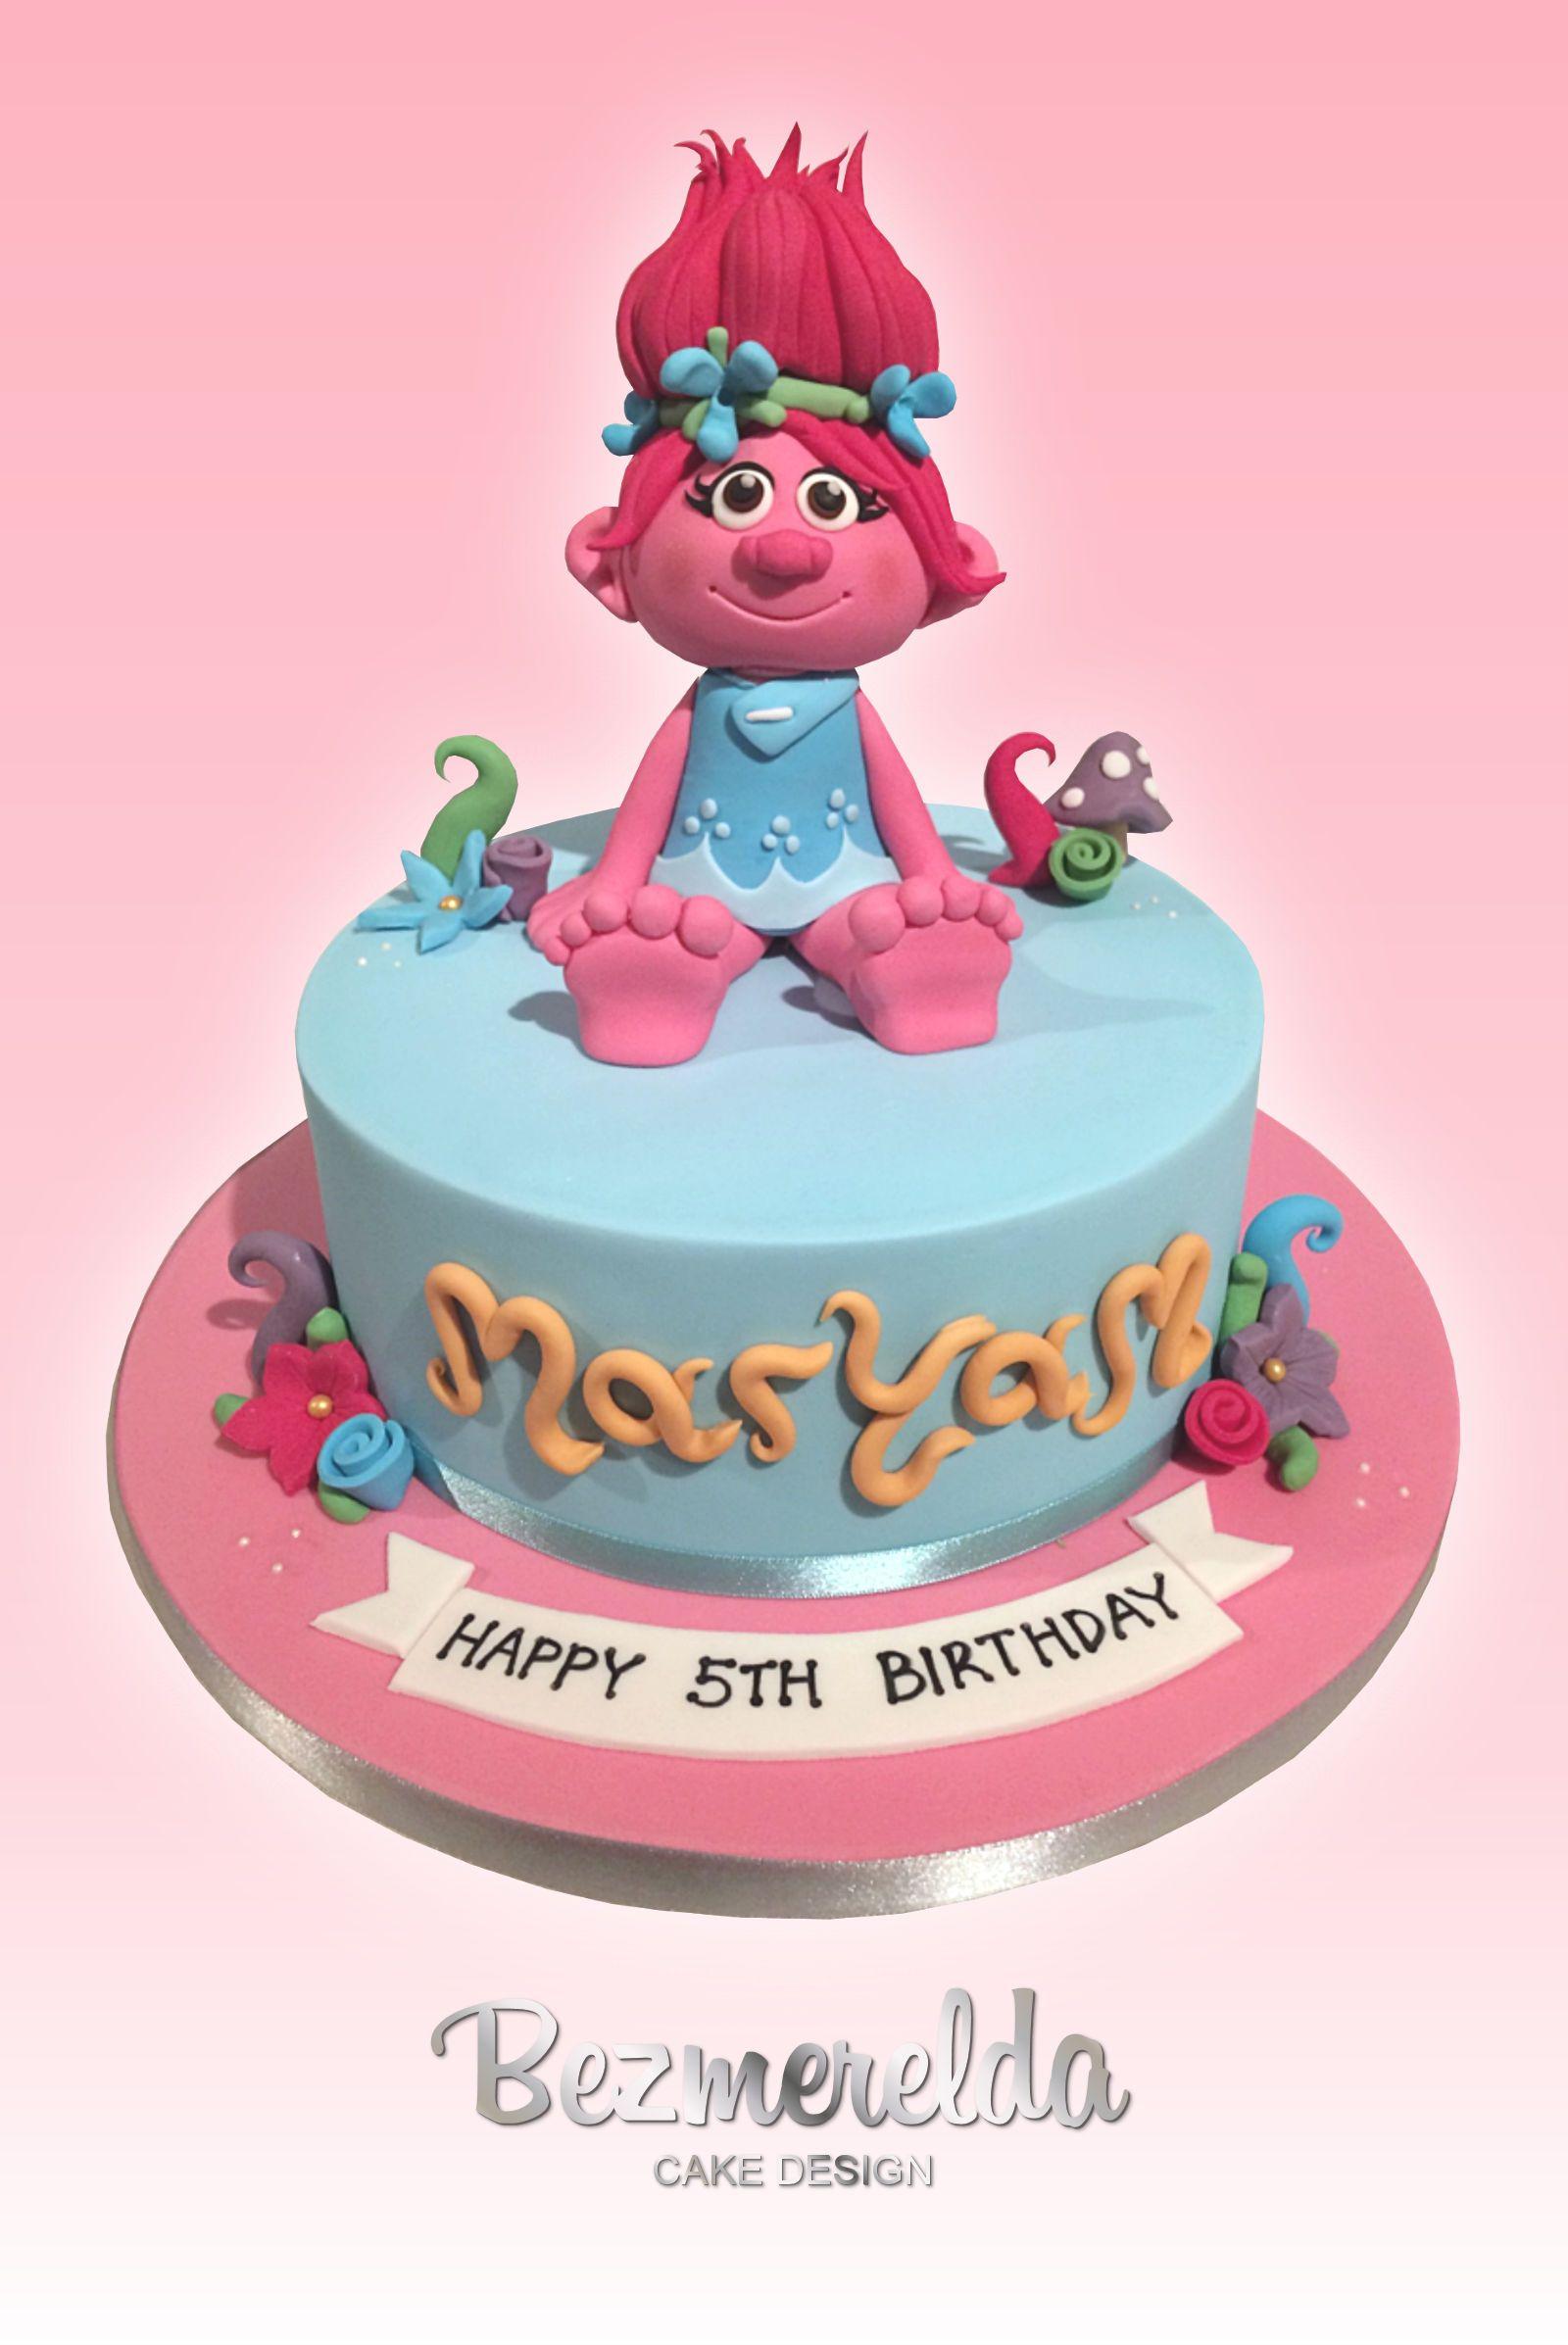 Cake Design Trolls : Trolls movie themed cake - Made by Bezmerelda Birthday ...